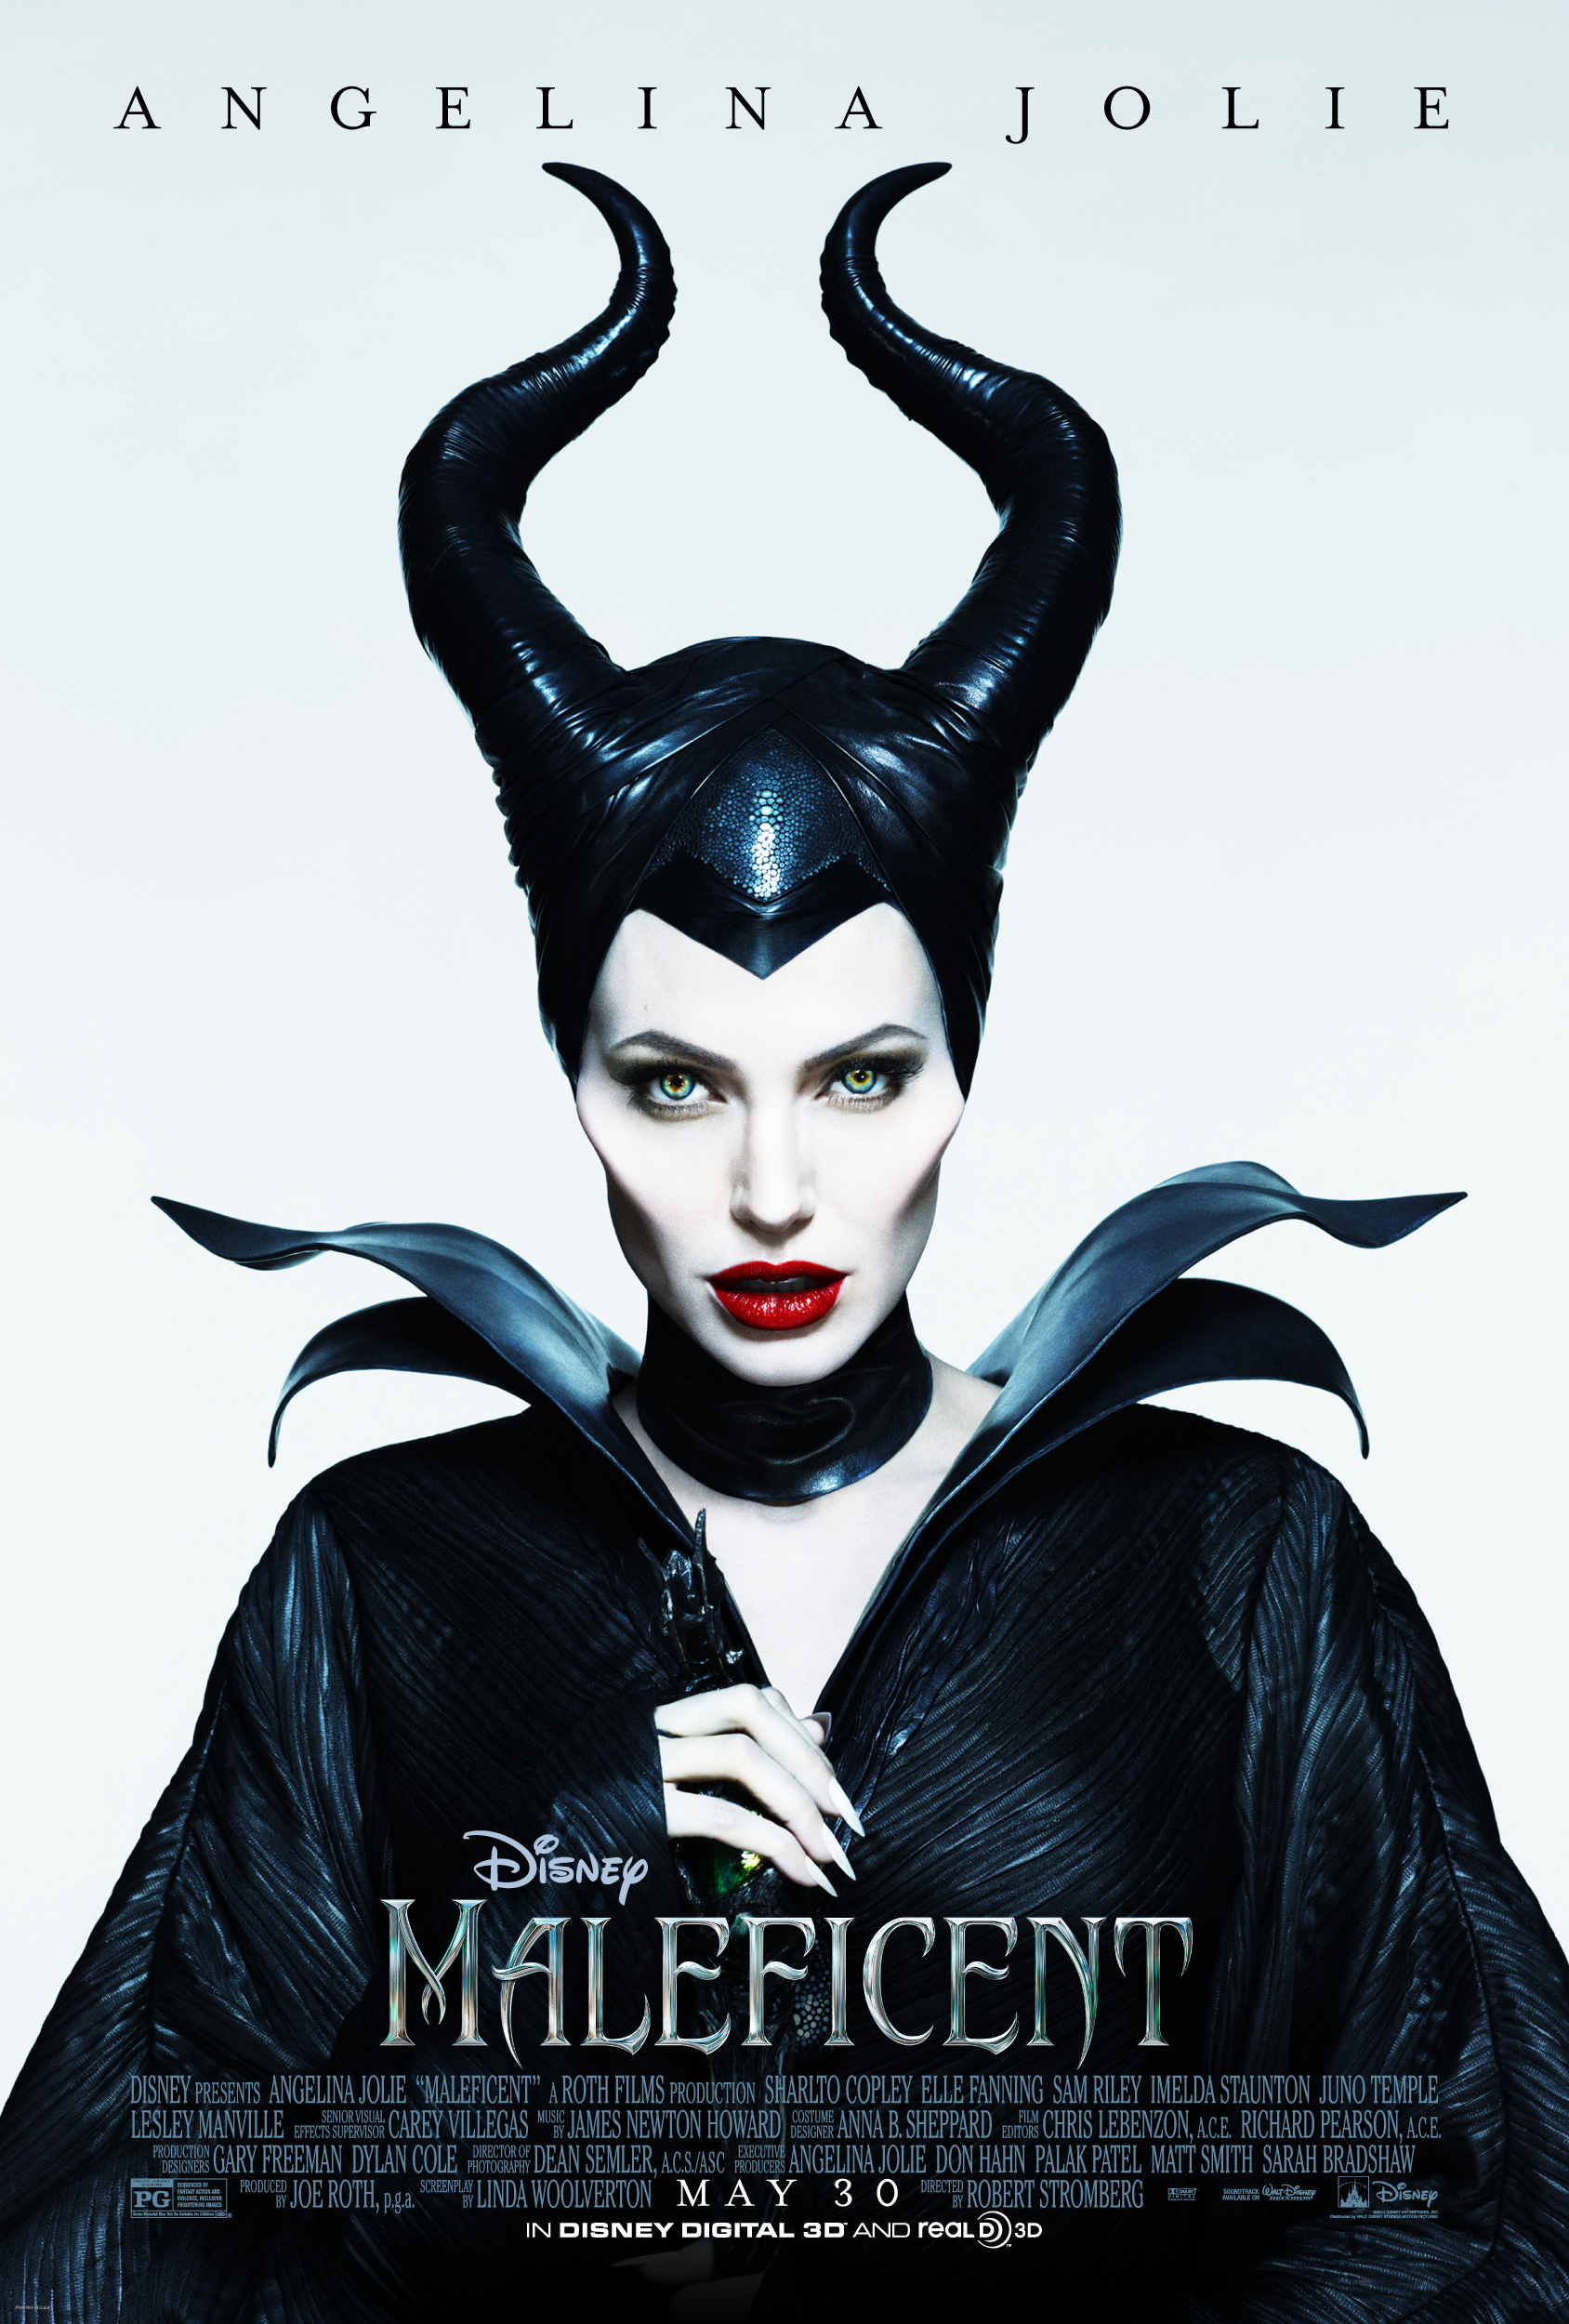 File:Maleficent poster.jpg